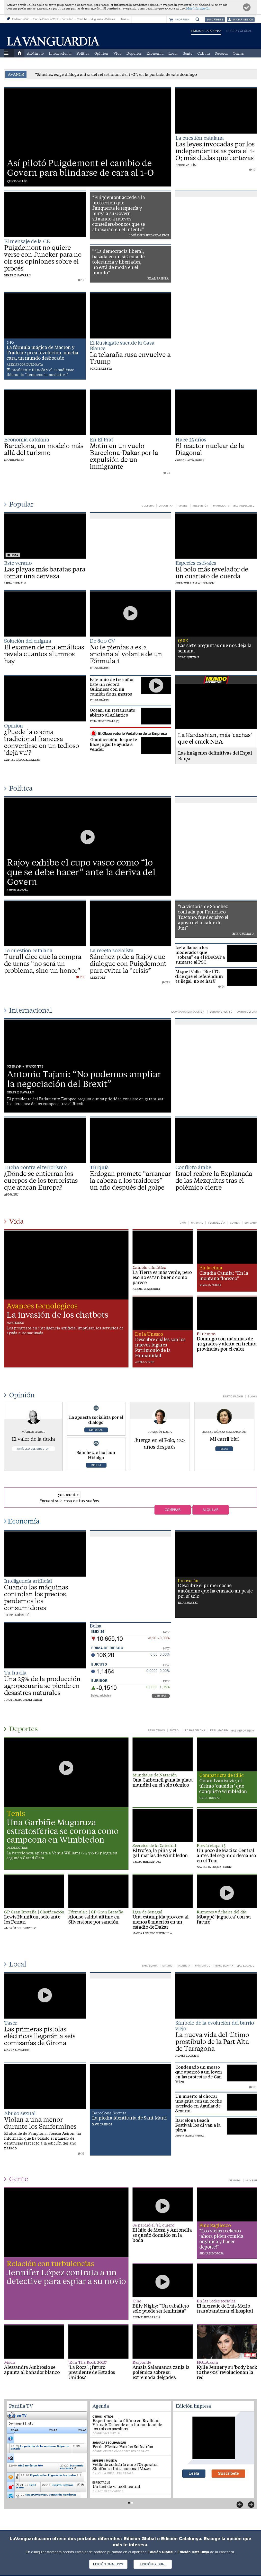 La Vanguardia at Sunday July 16, 2017, 5:26 a.m. UTC